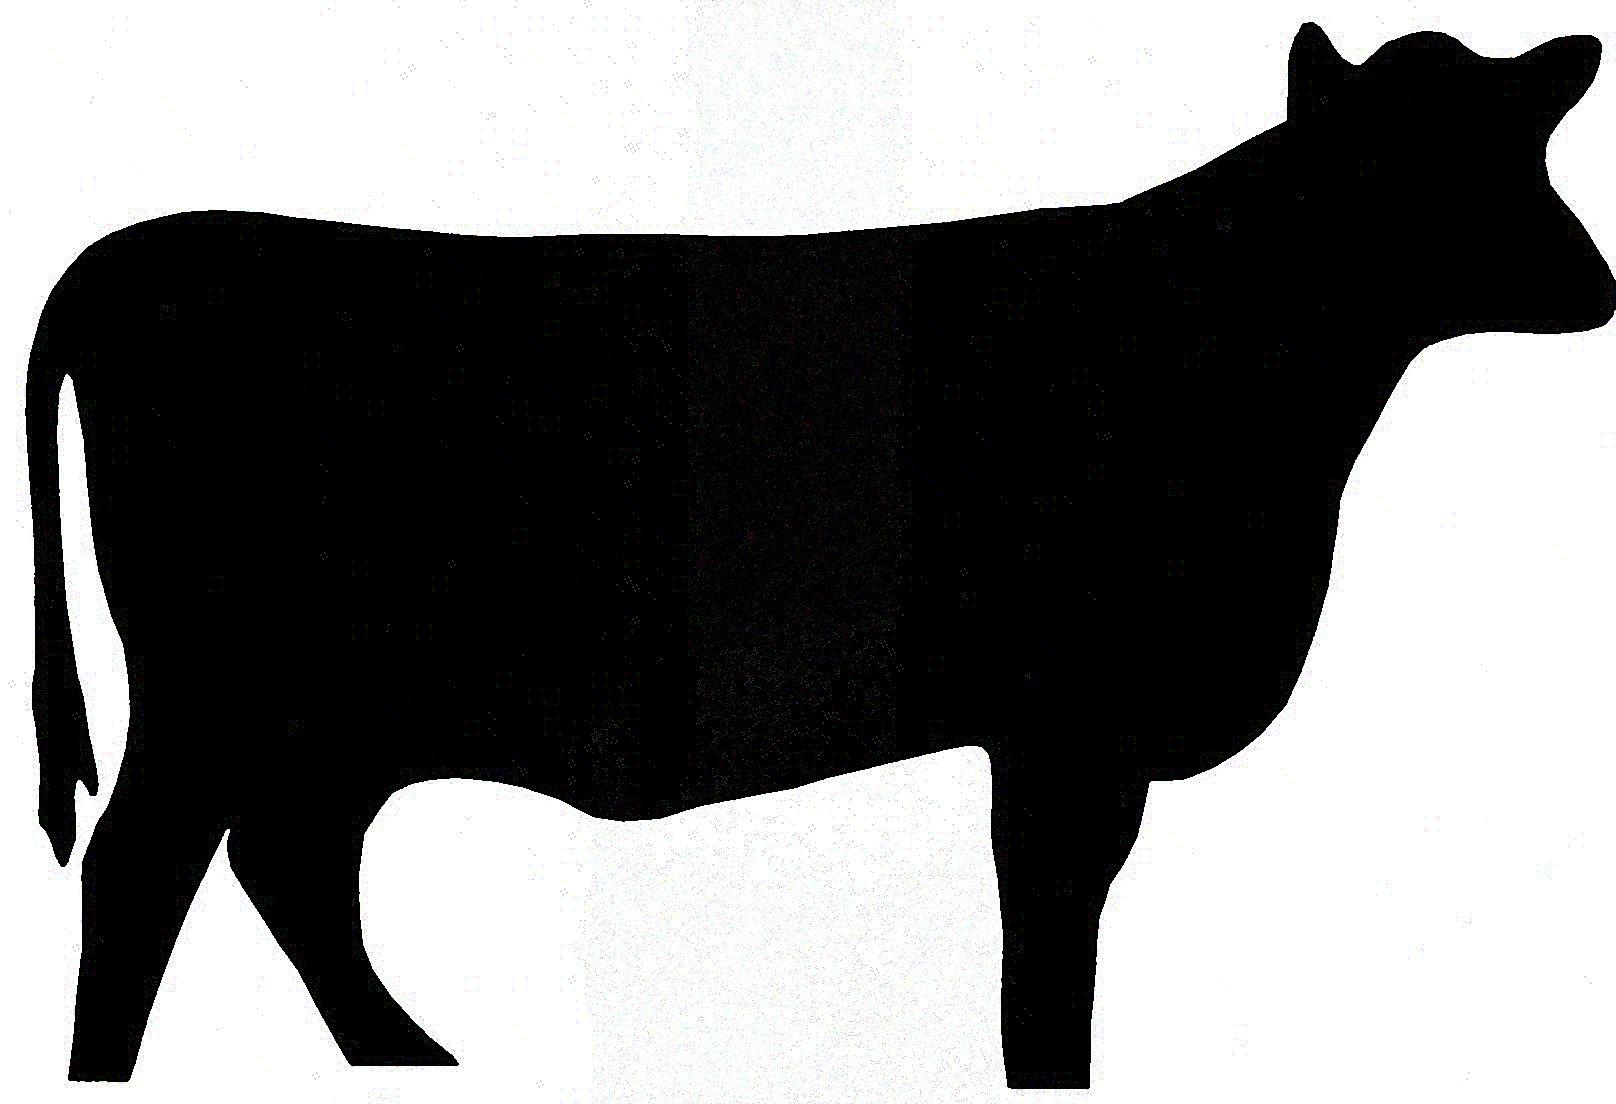 Cow Head Silhouette Clip Art Clipart Pan-Cow Head Silhouette Clip Art Clipart Panda Free Clipart Images-7